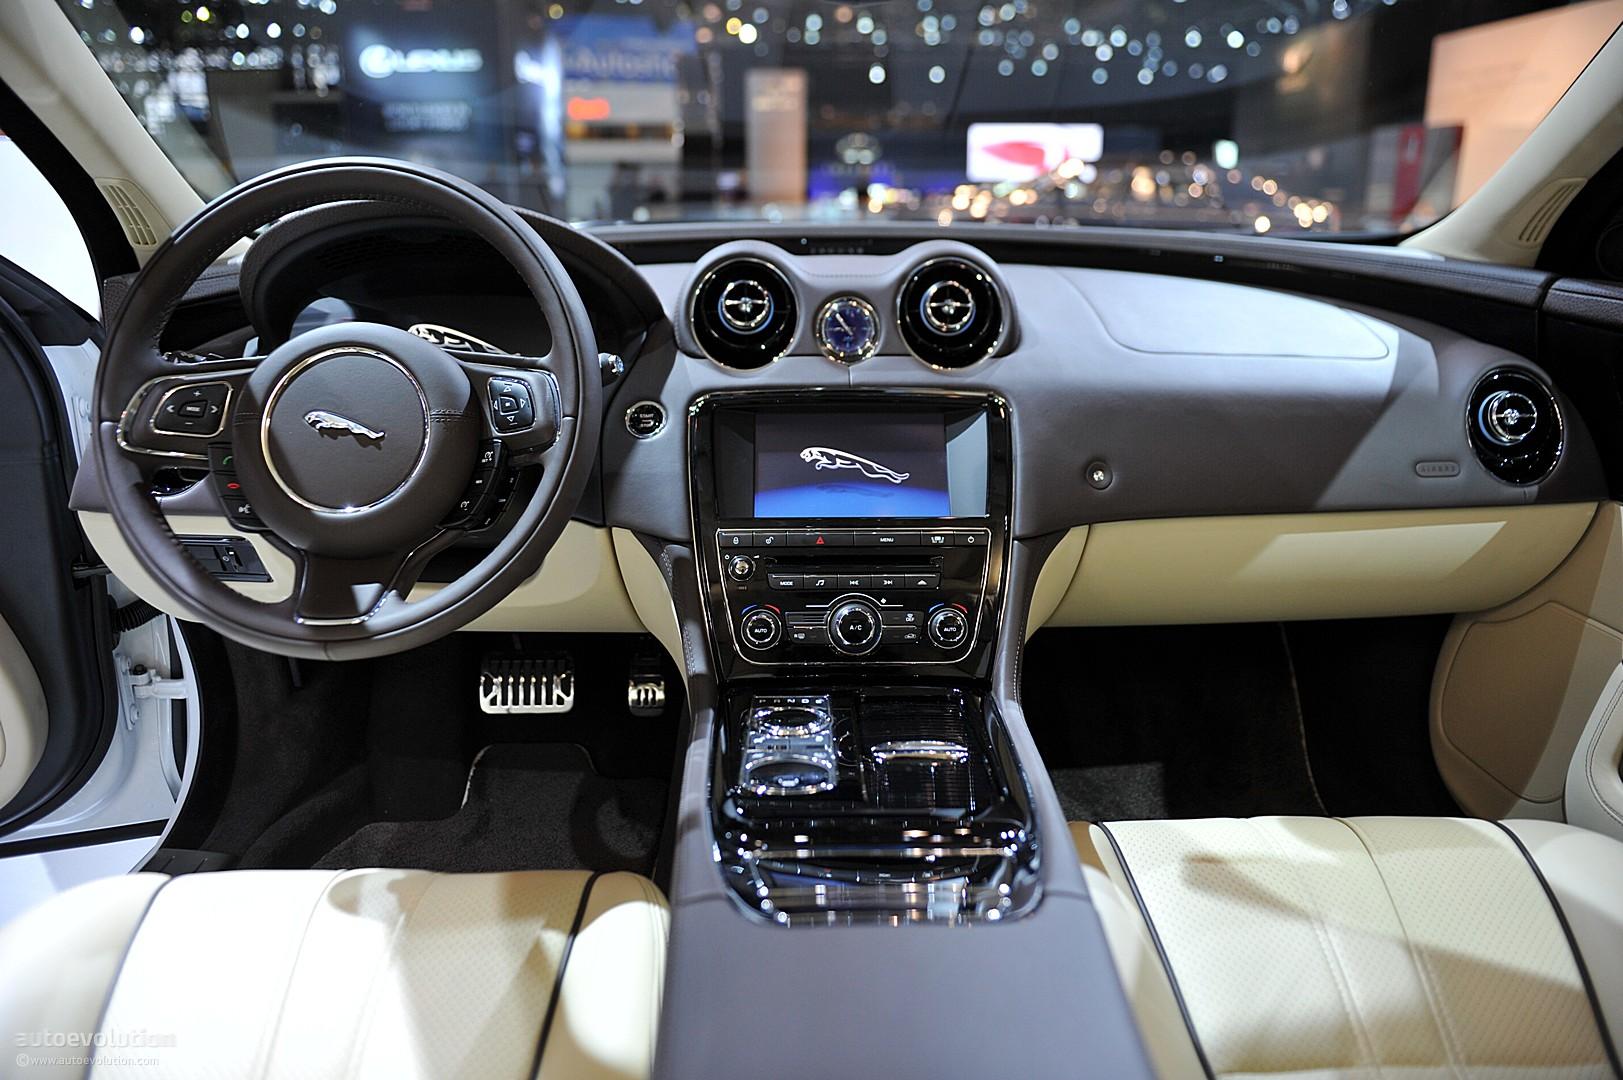 NYIAS Jaguar XJL Supersport Live Photos Autoevolution - 2011 jaguar xj supersport